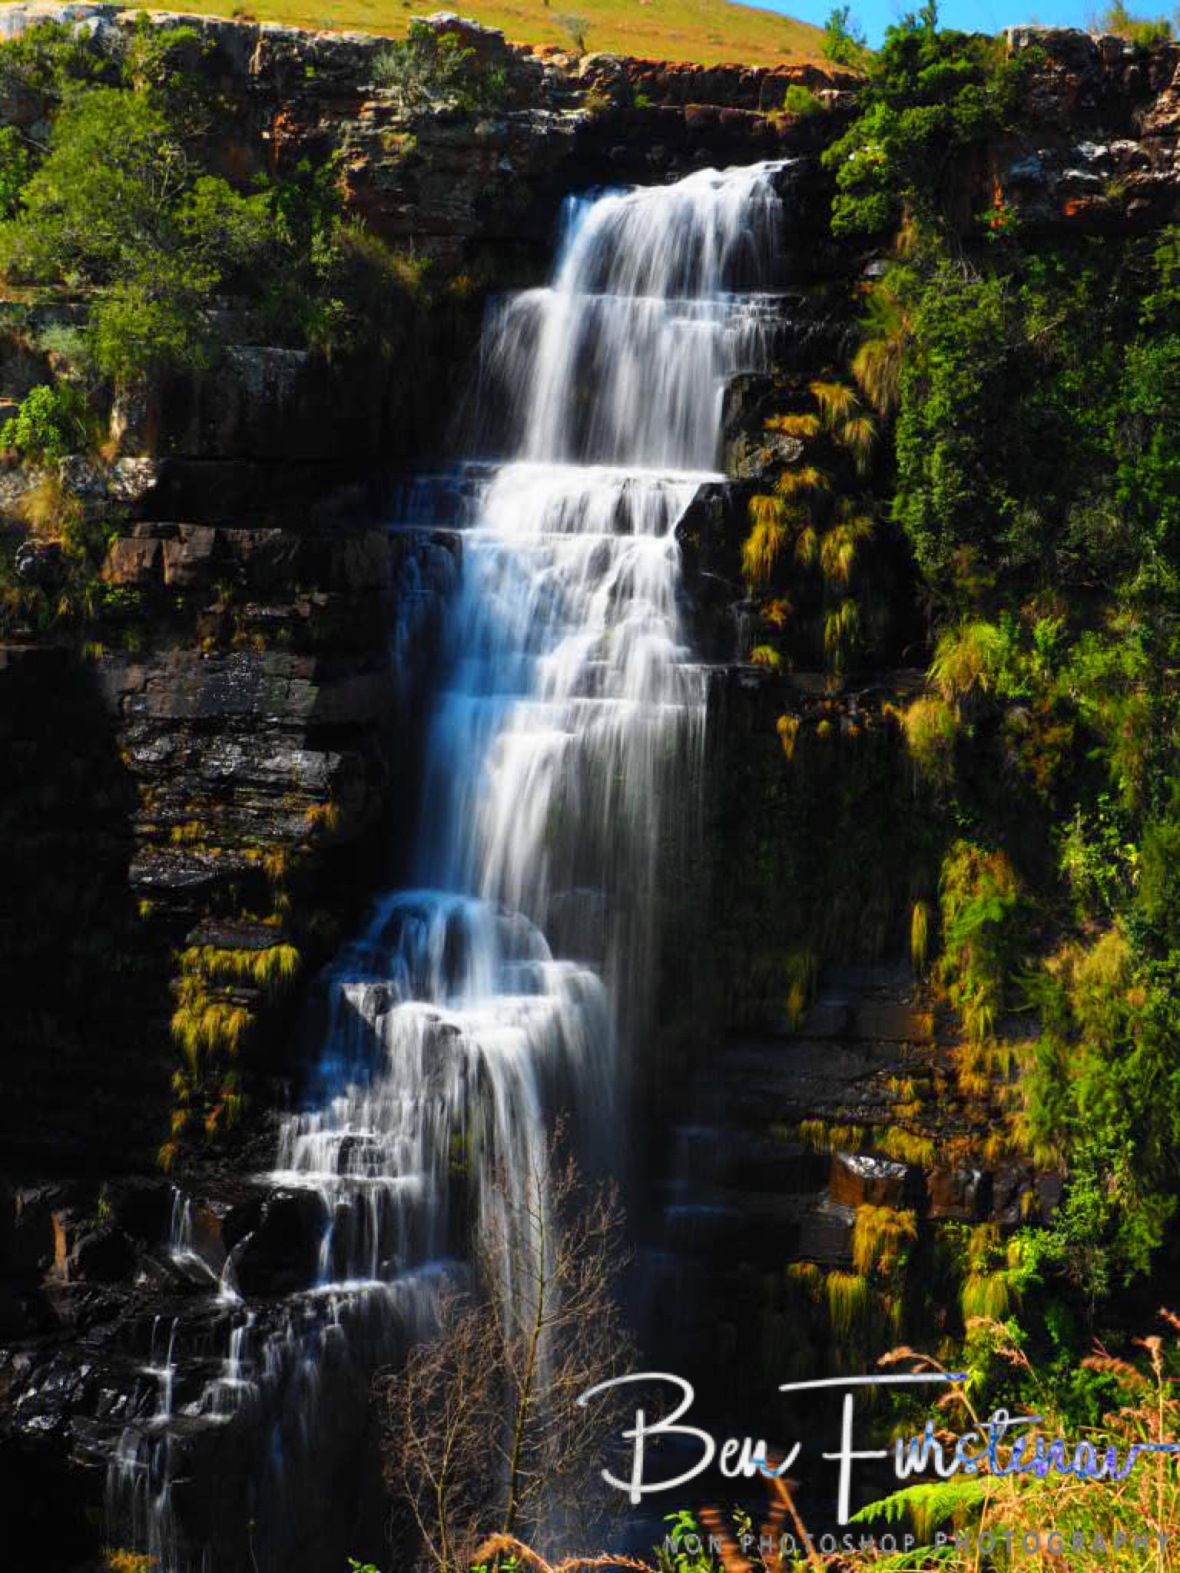 The narrow section off The Lisbon Falls, Mpumalanga